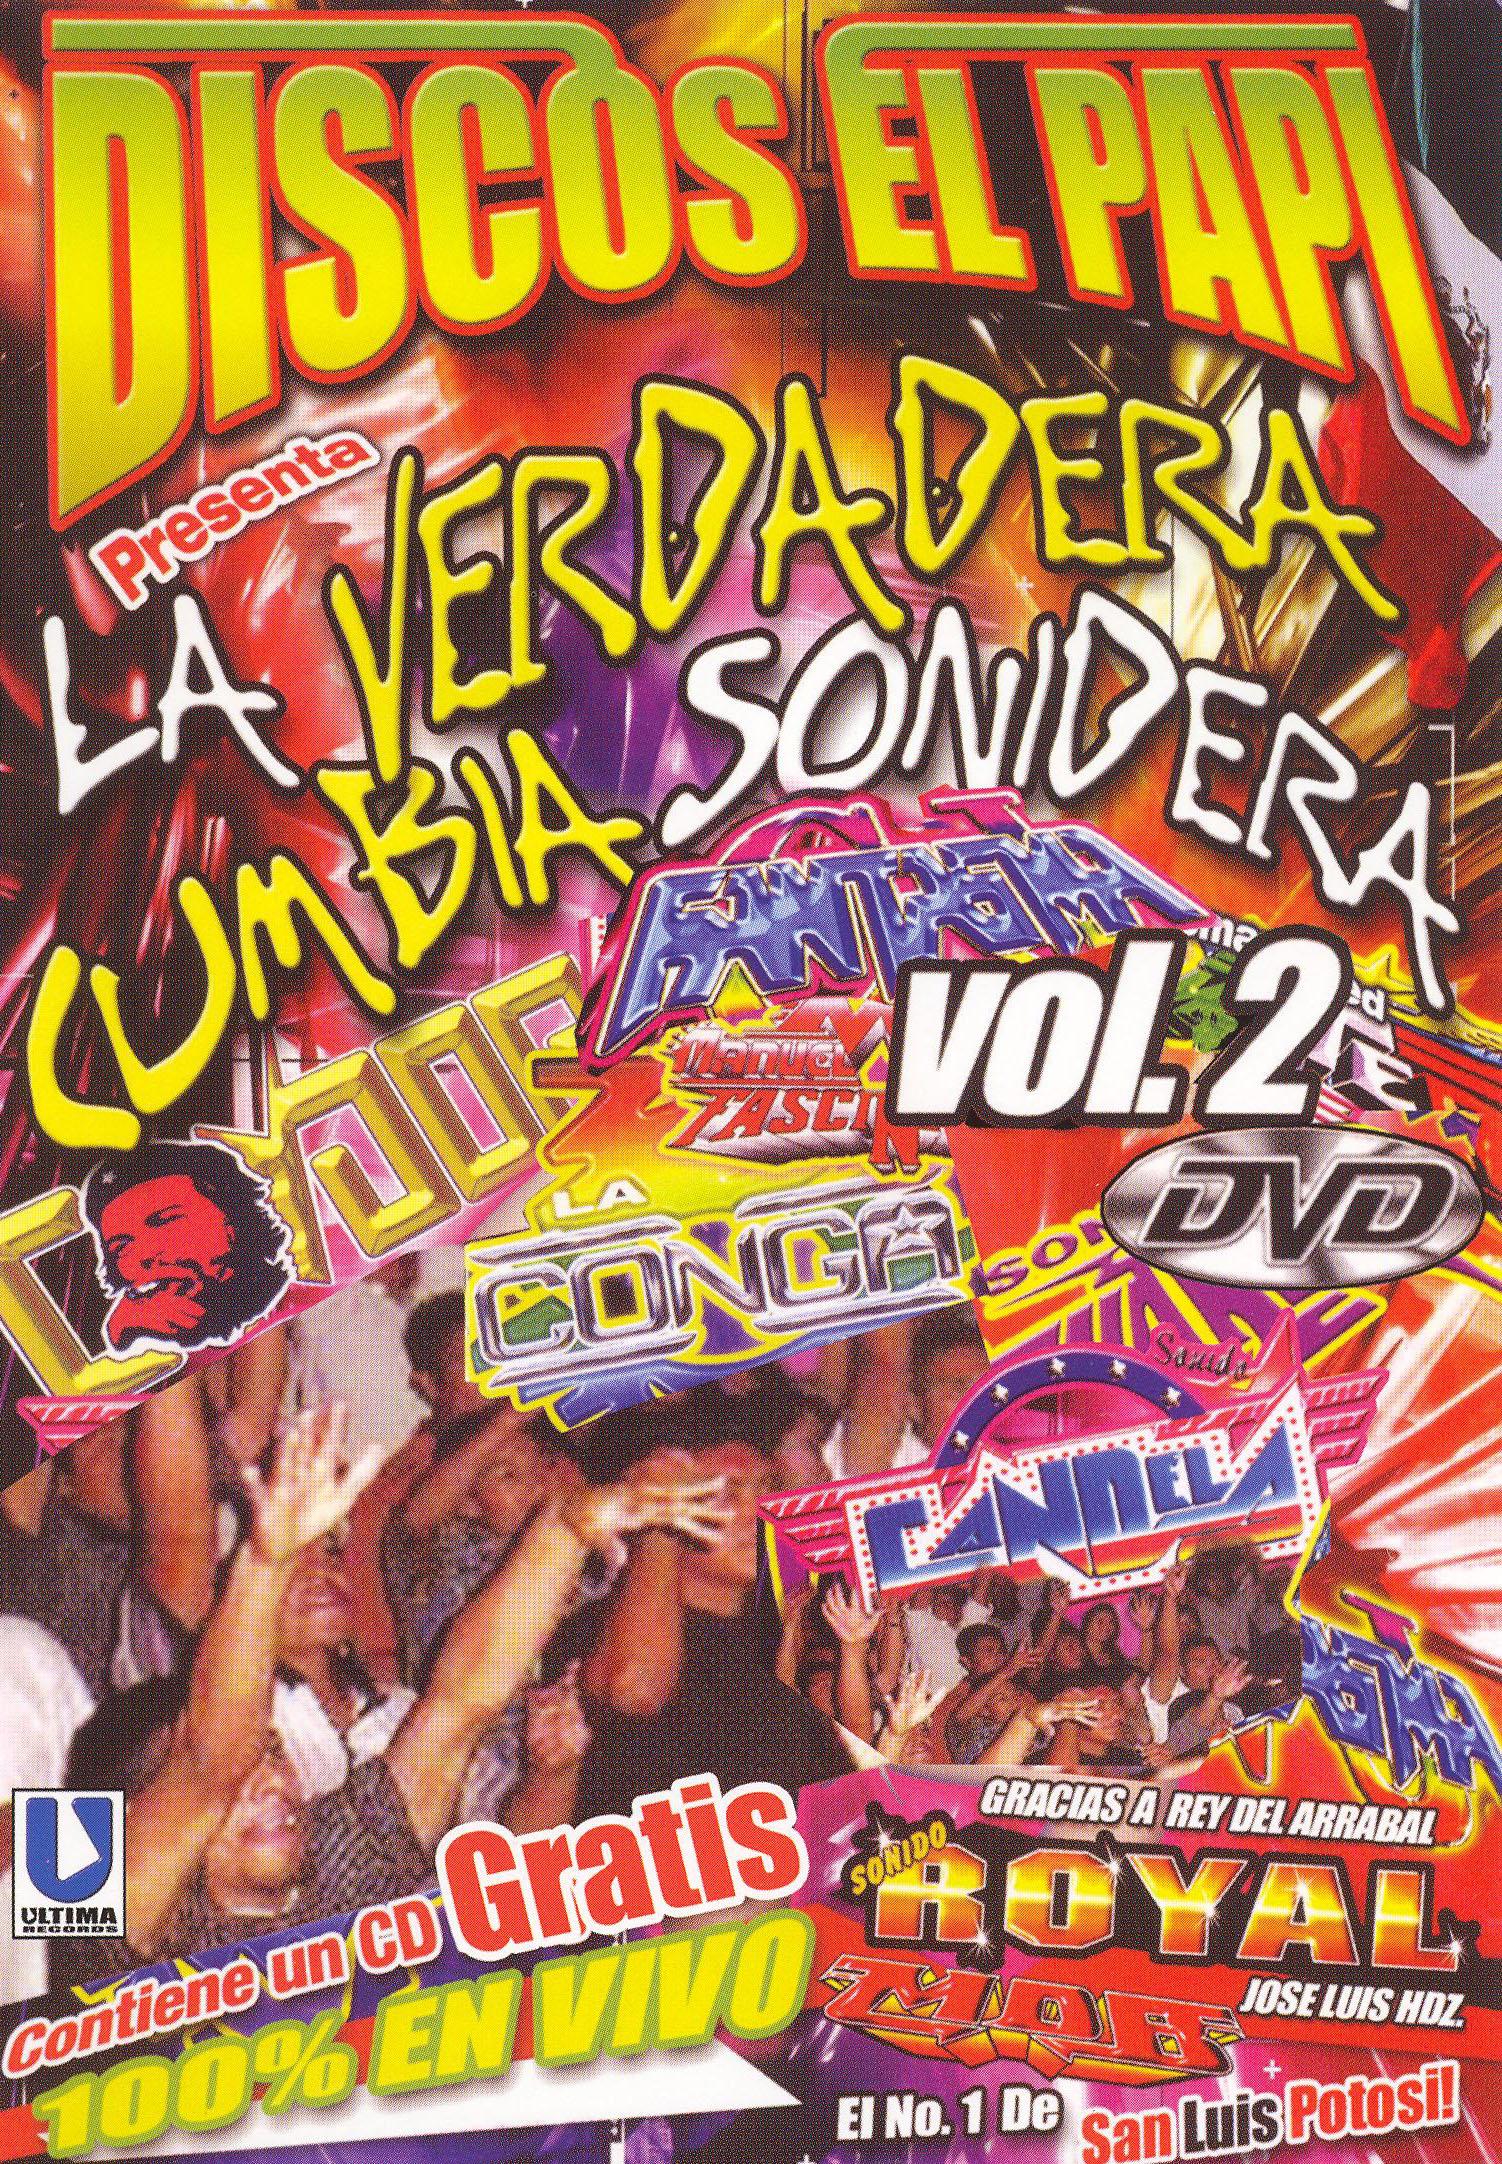 La Verdadera Cumbia Sonidera, Vol. 2